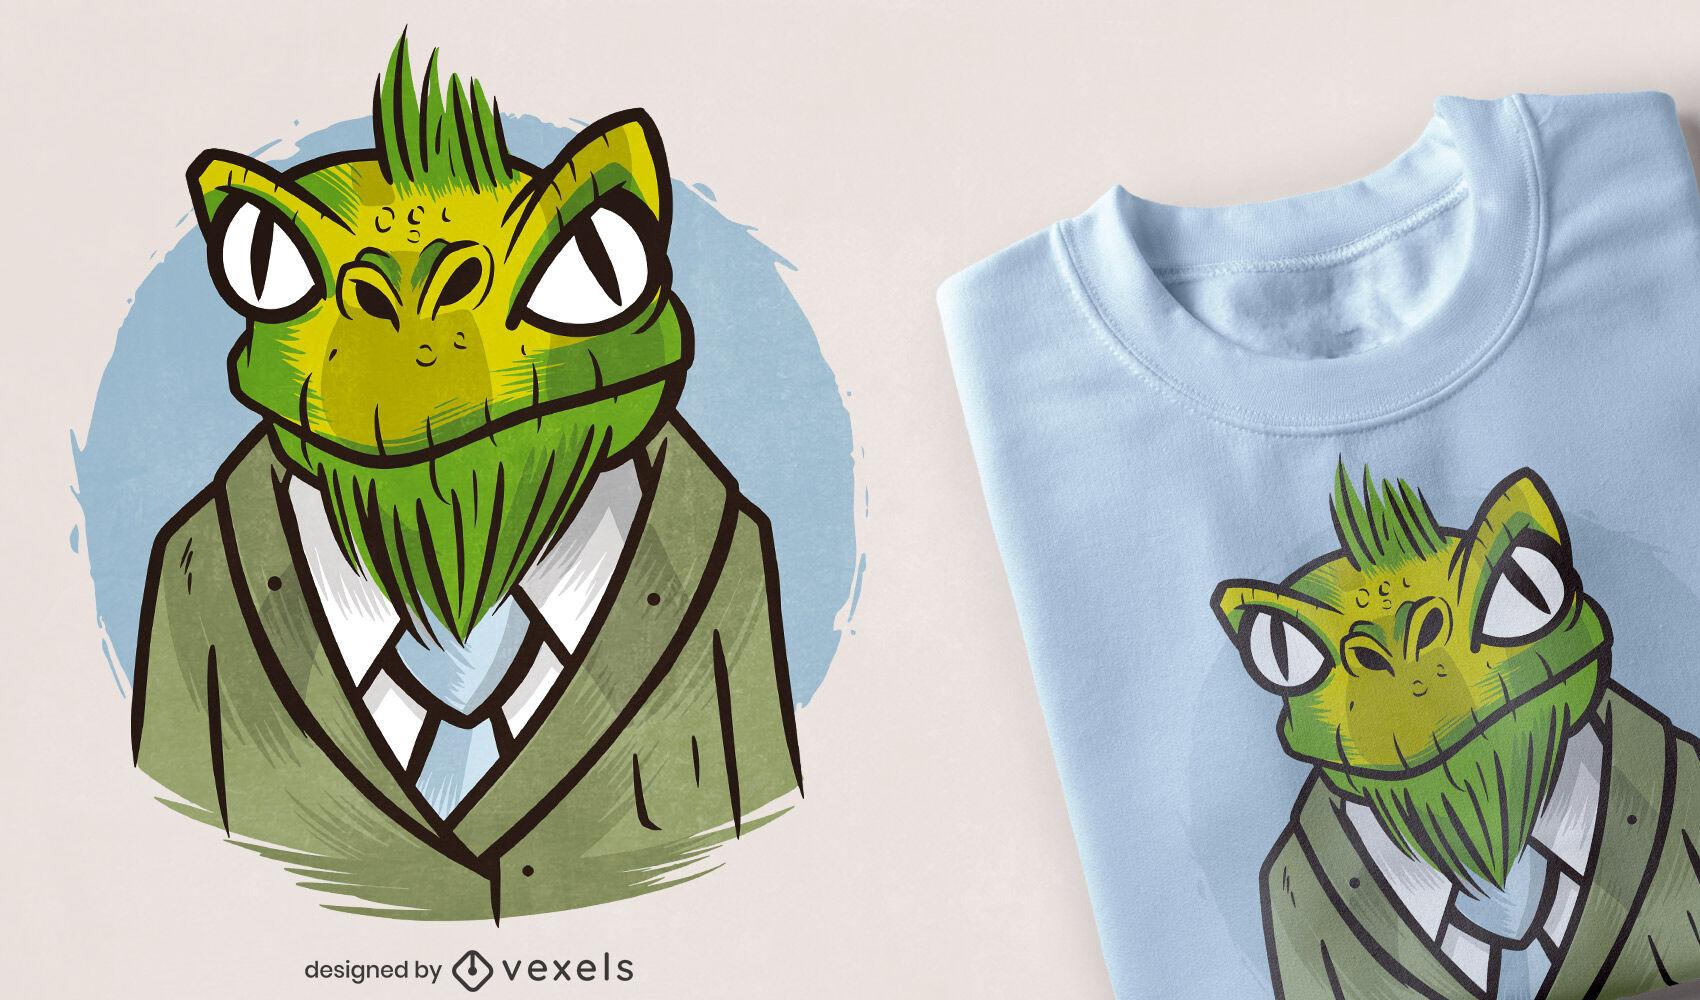 Dise?o de camiseta de traje de dibujos animados de lagarto